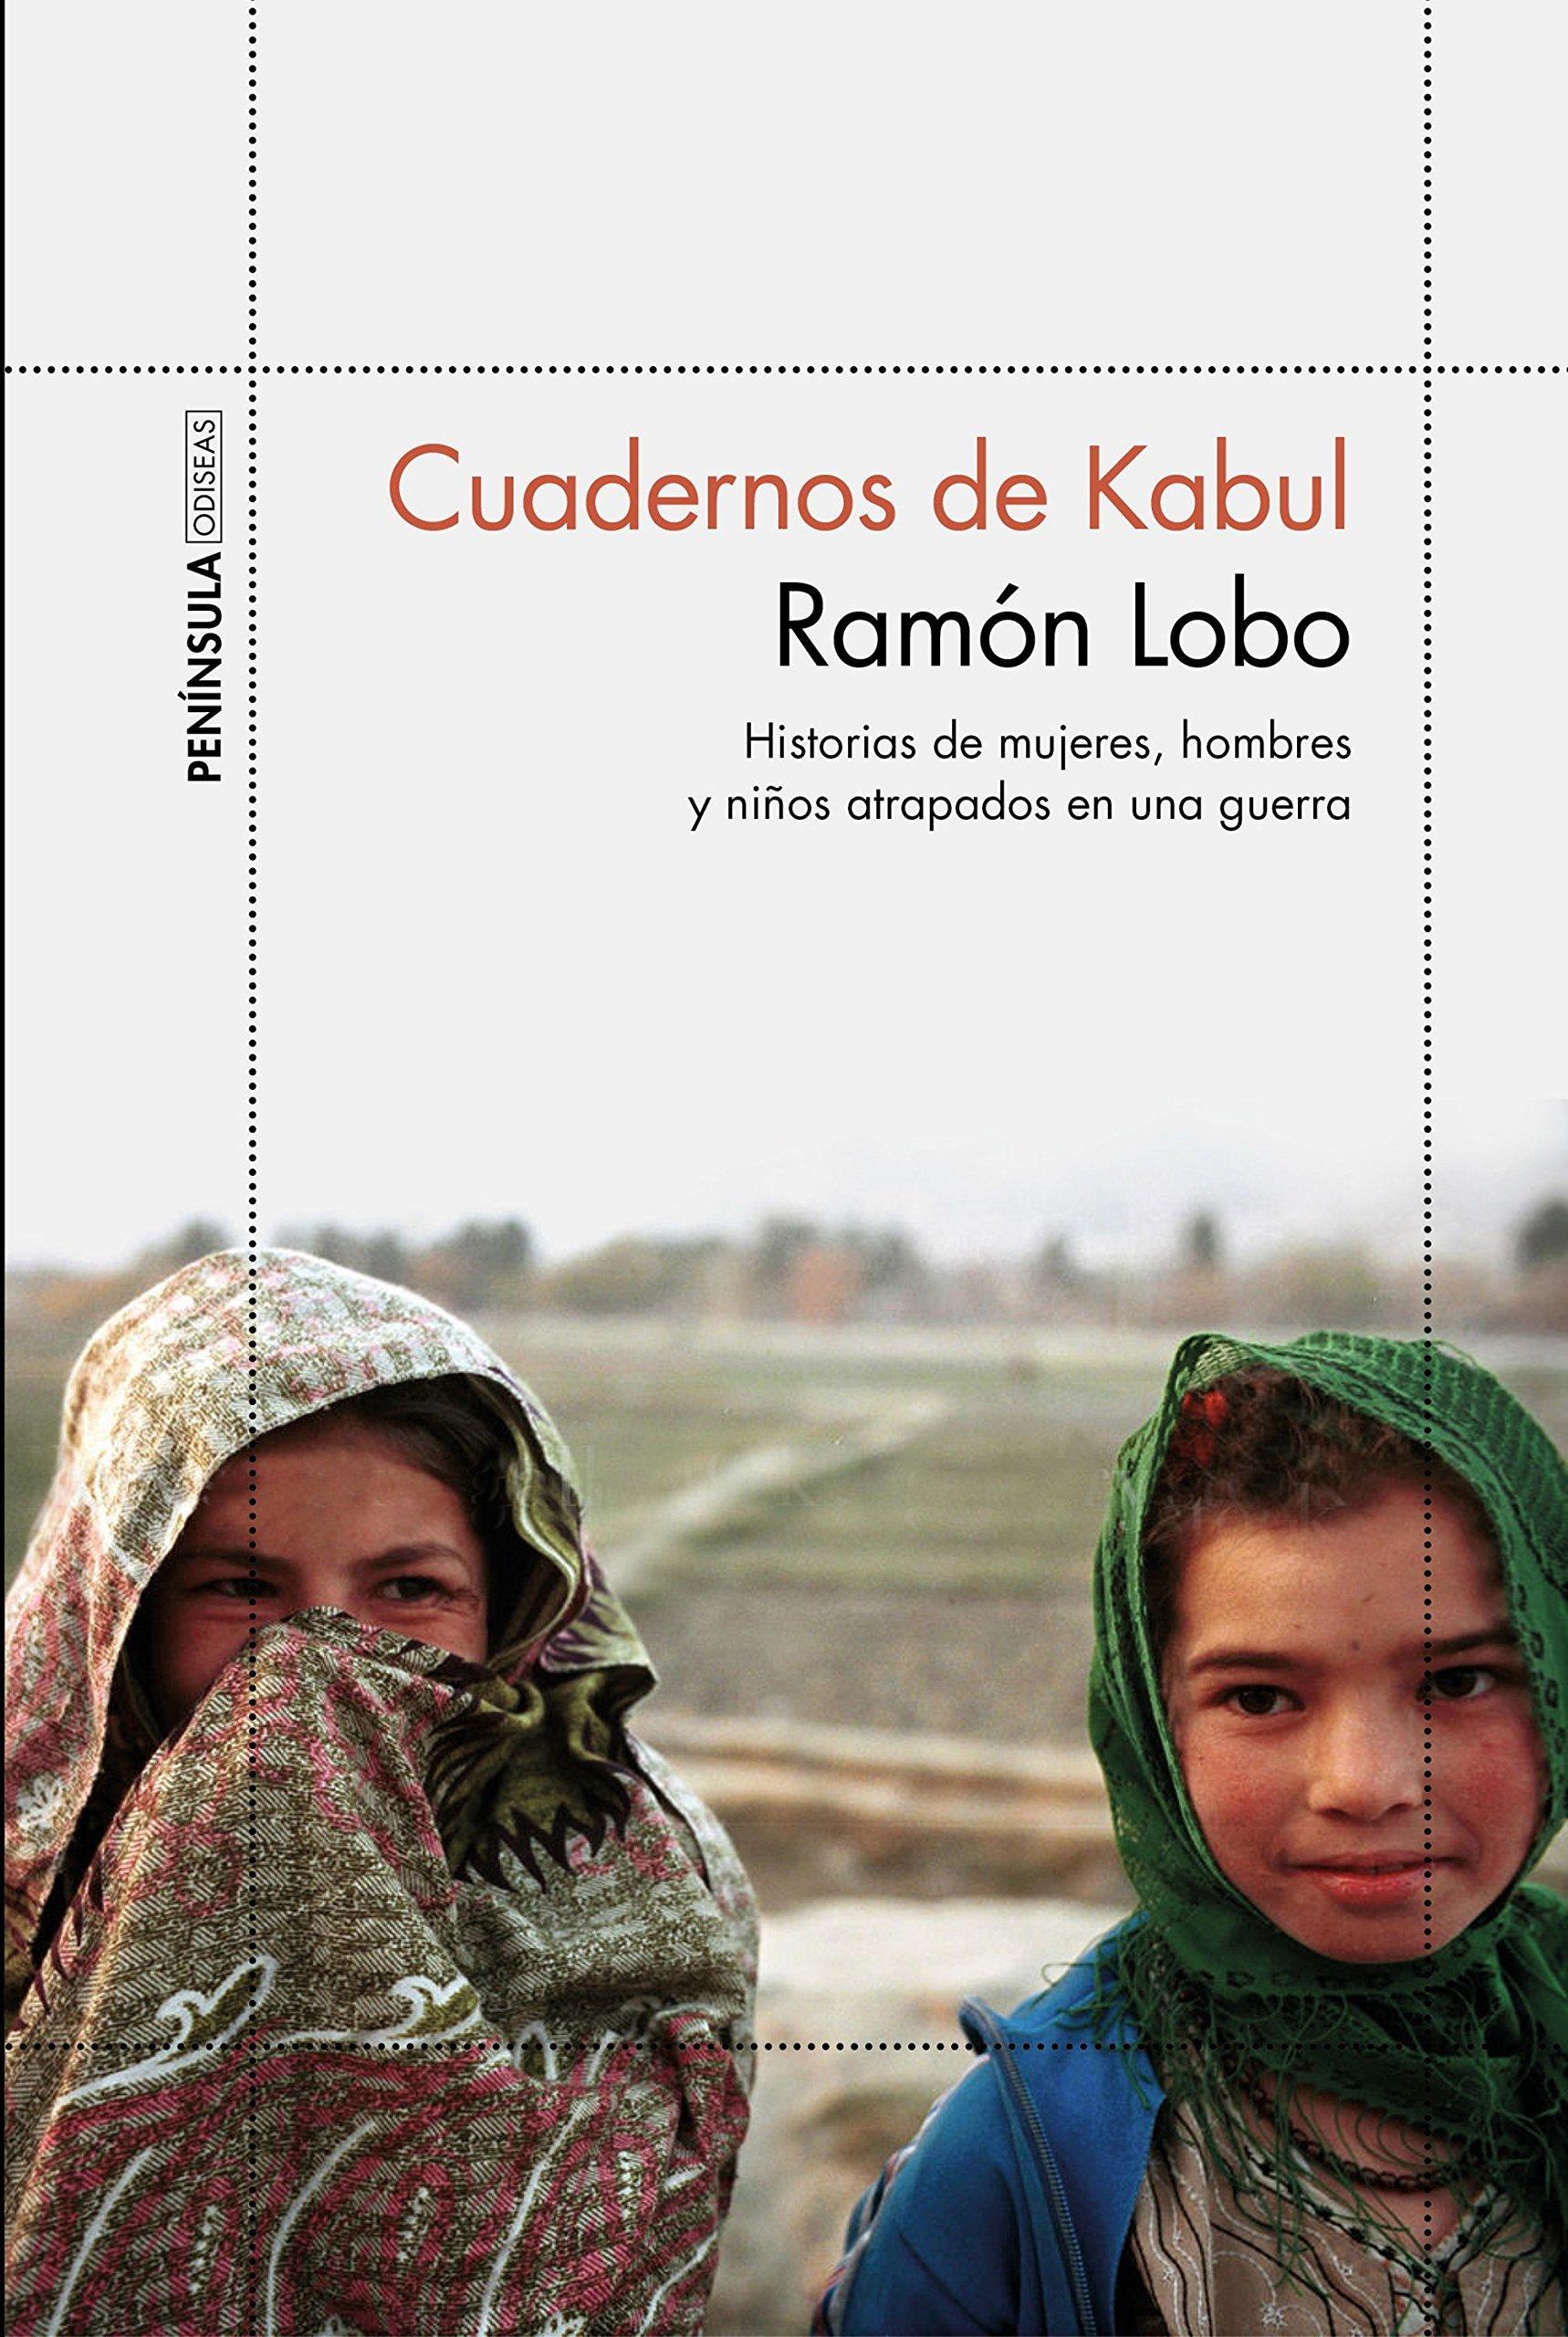 Cuadernos de Kabul.